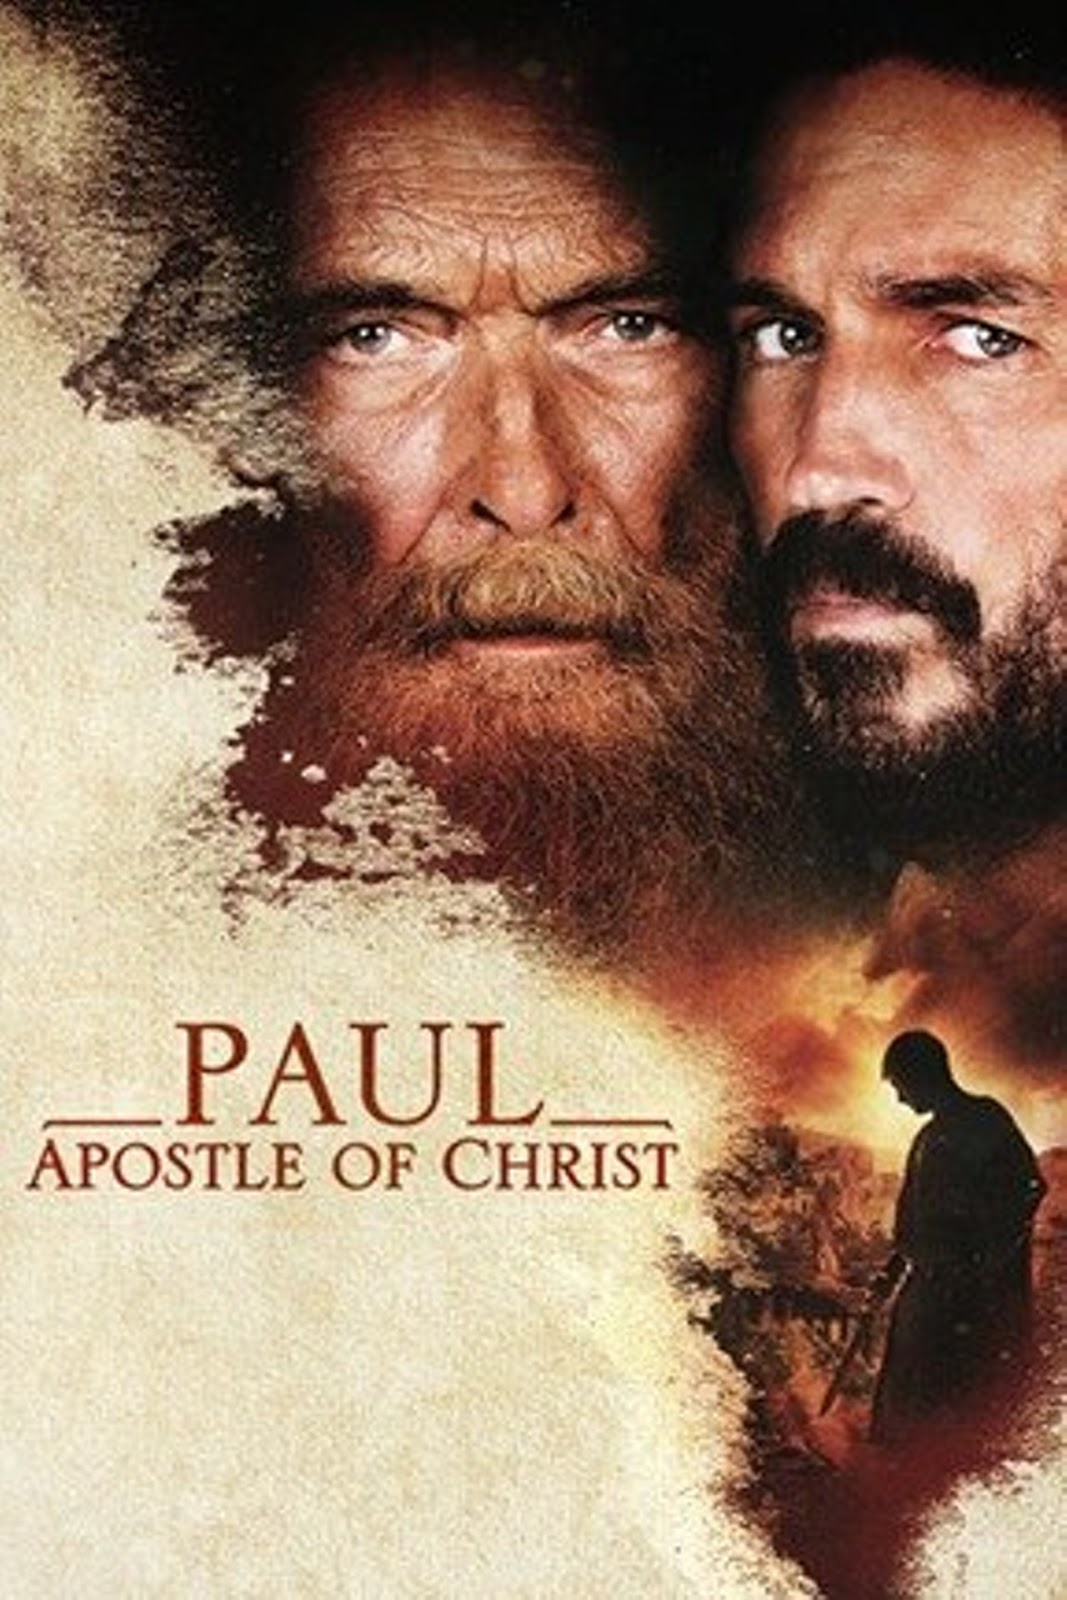 Paul, Apostle of Christ [2018] [DVDR] [NTSC] [Latino]